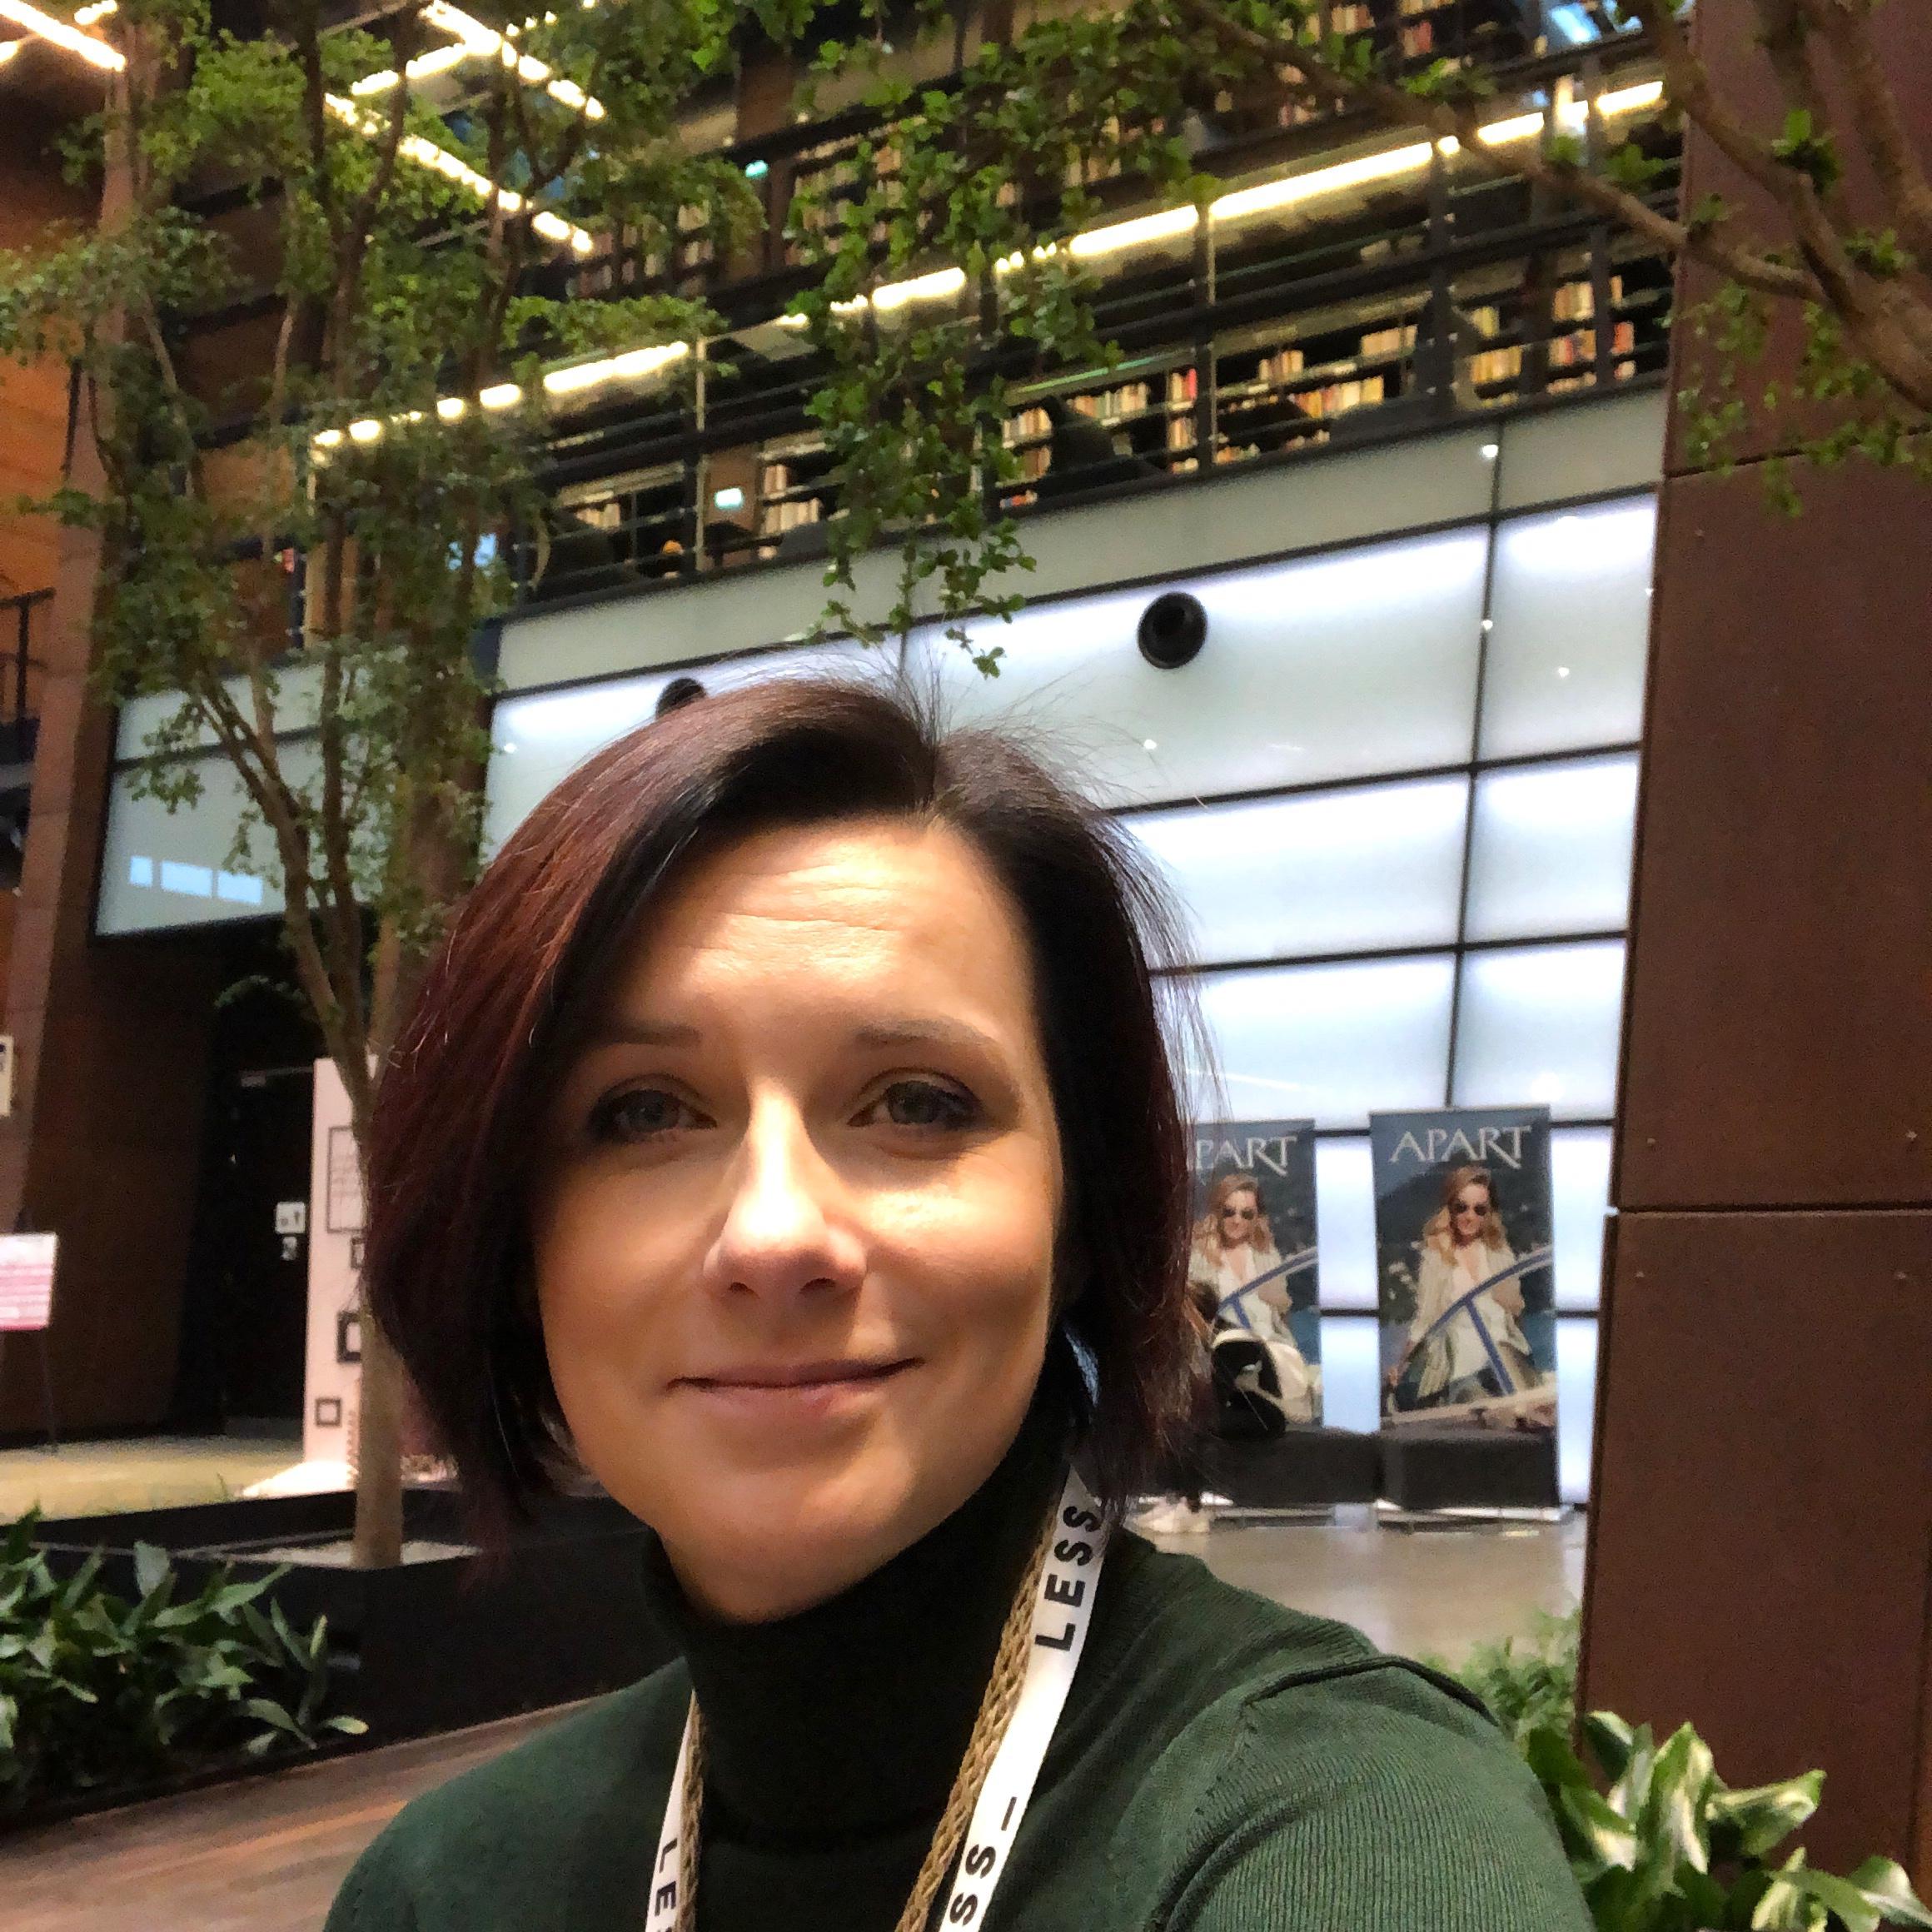 Paulina poleca kursy online w Multikursie